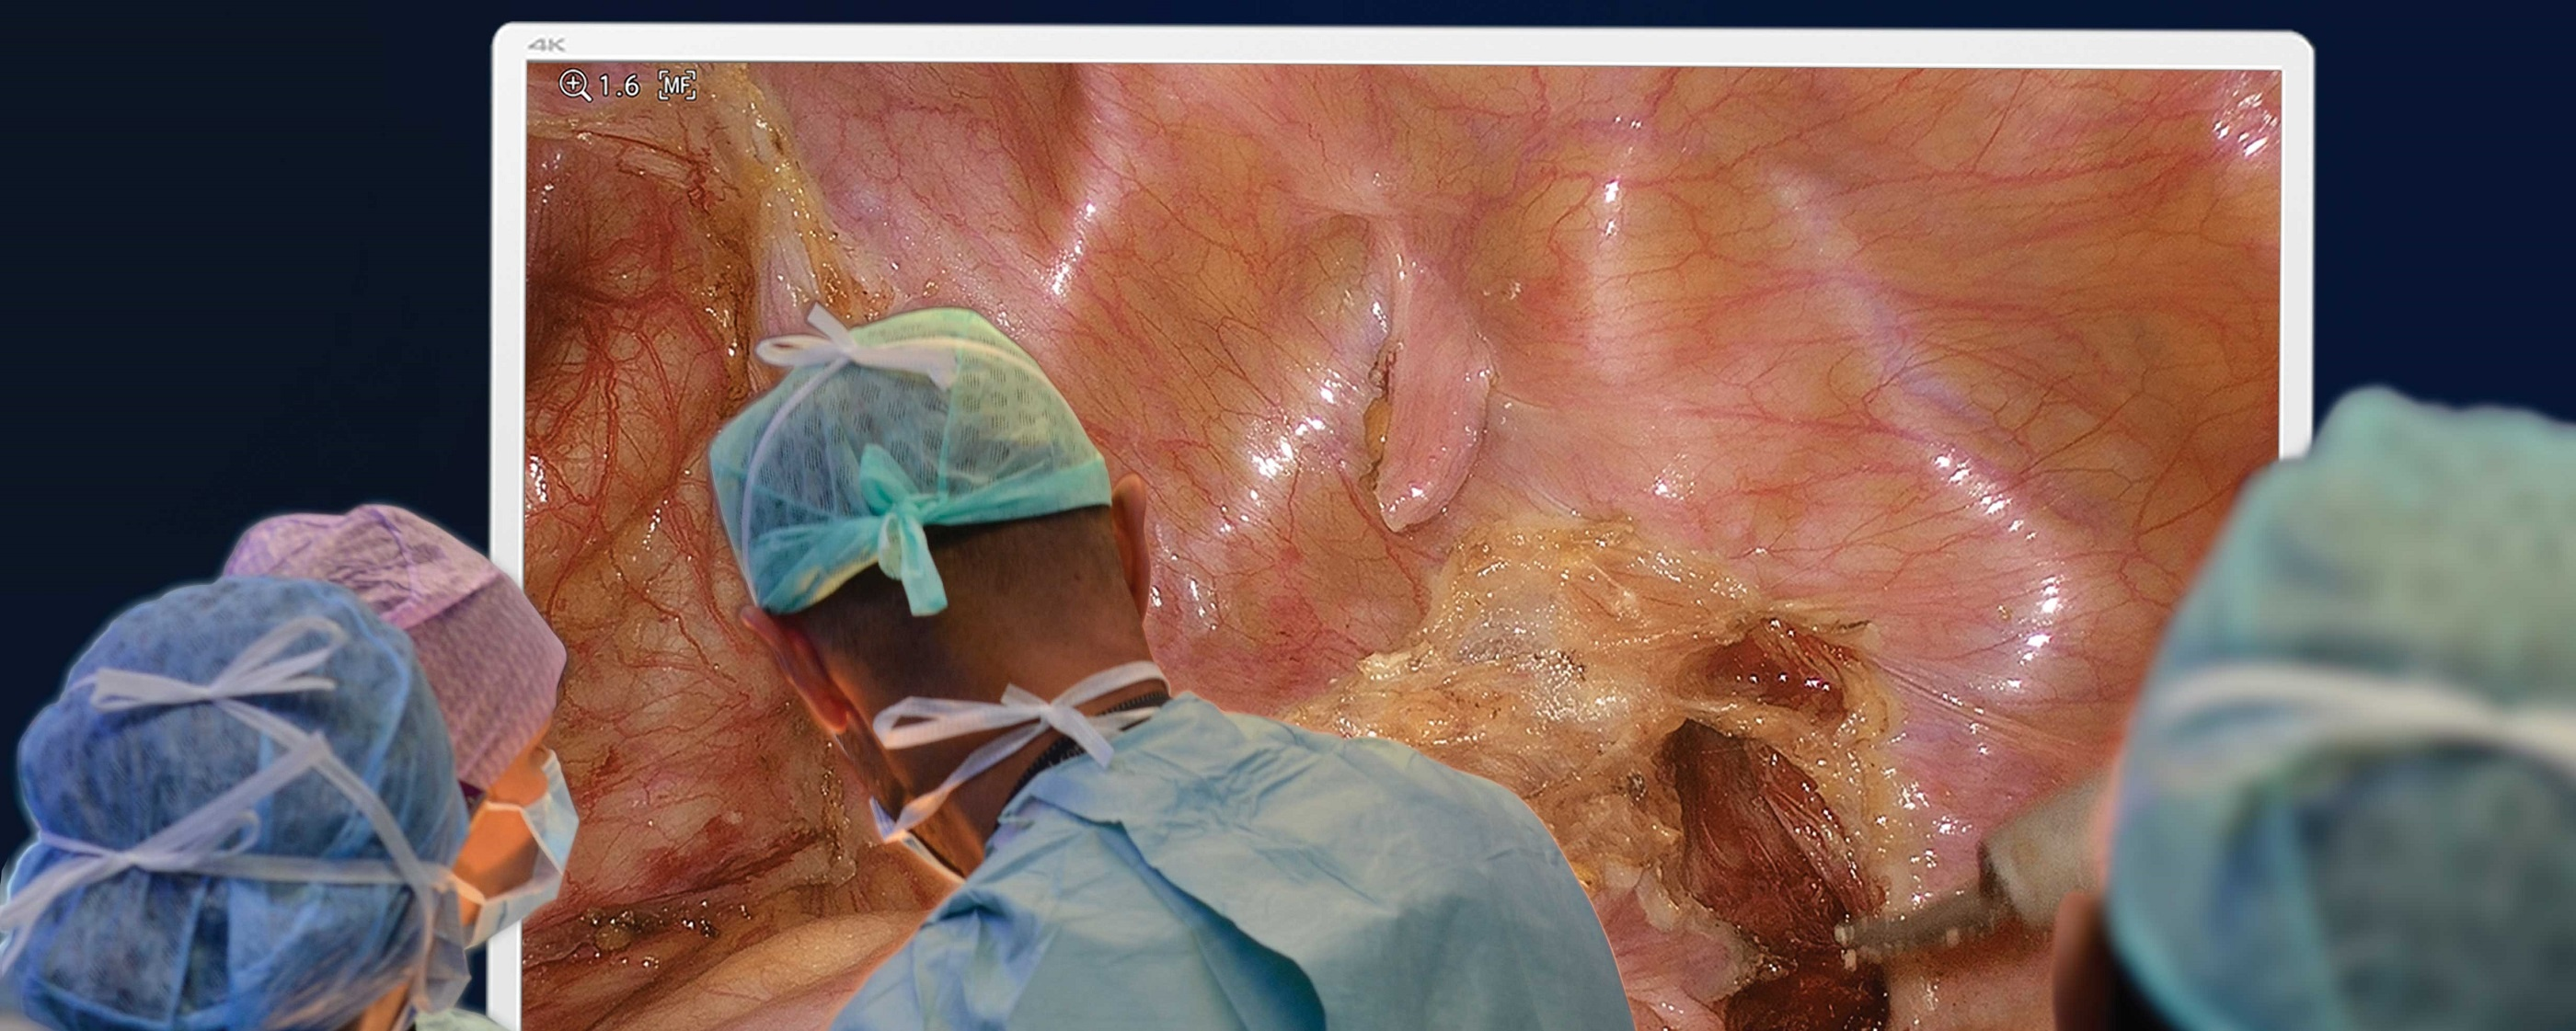 55-inch-clinical-image_bleed_sharp_crop.jpg